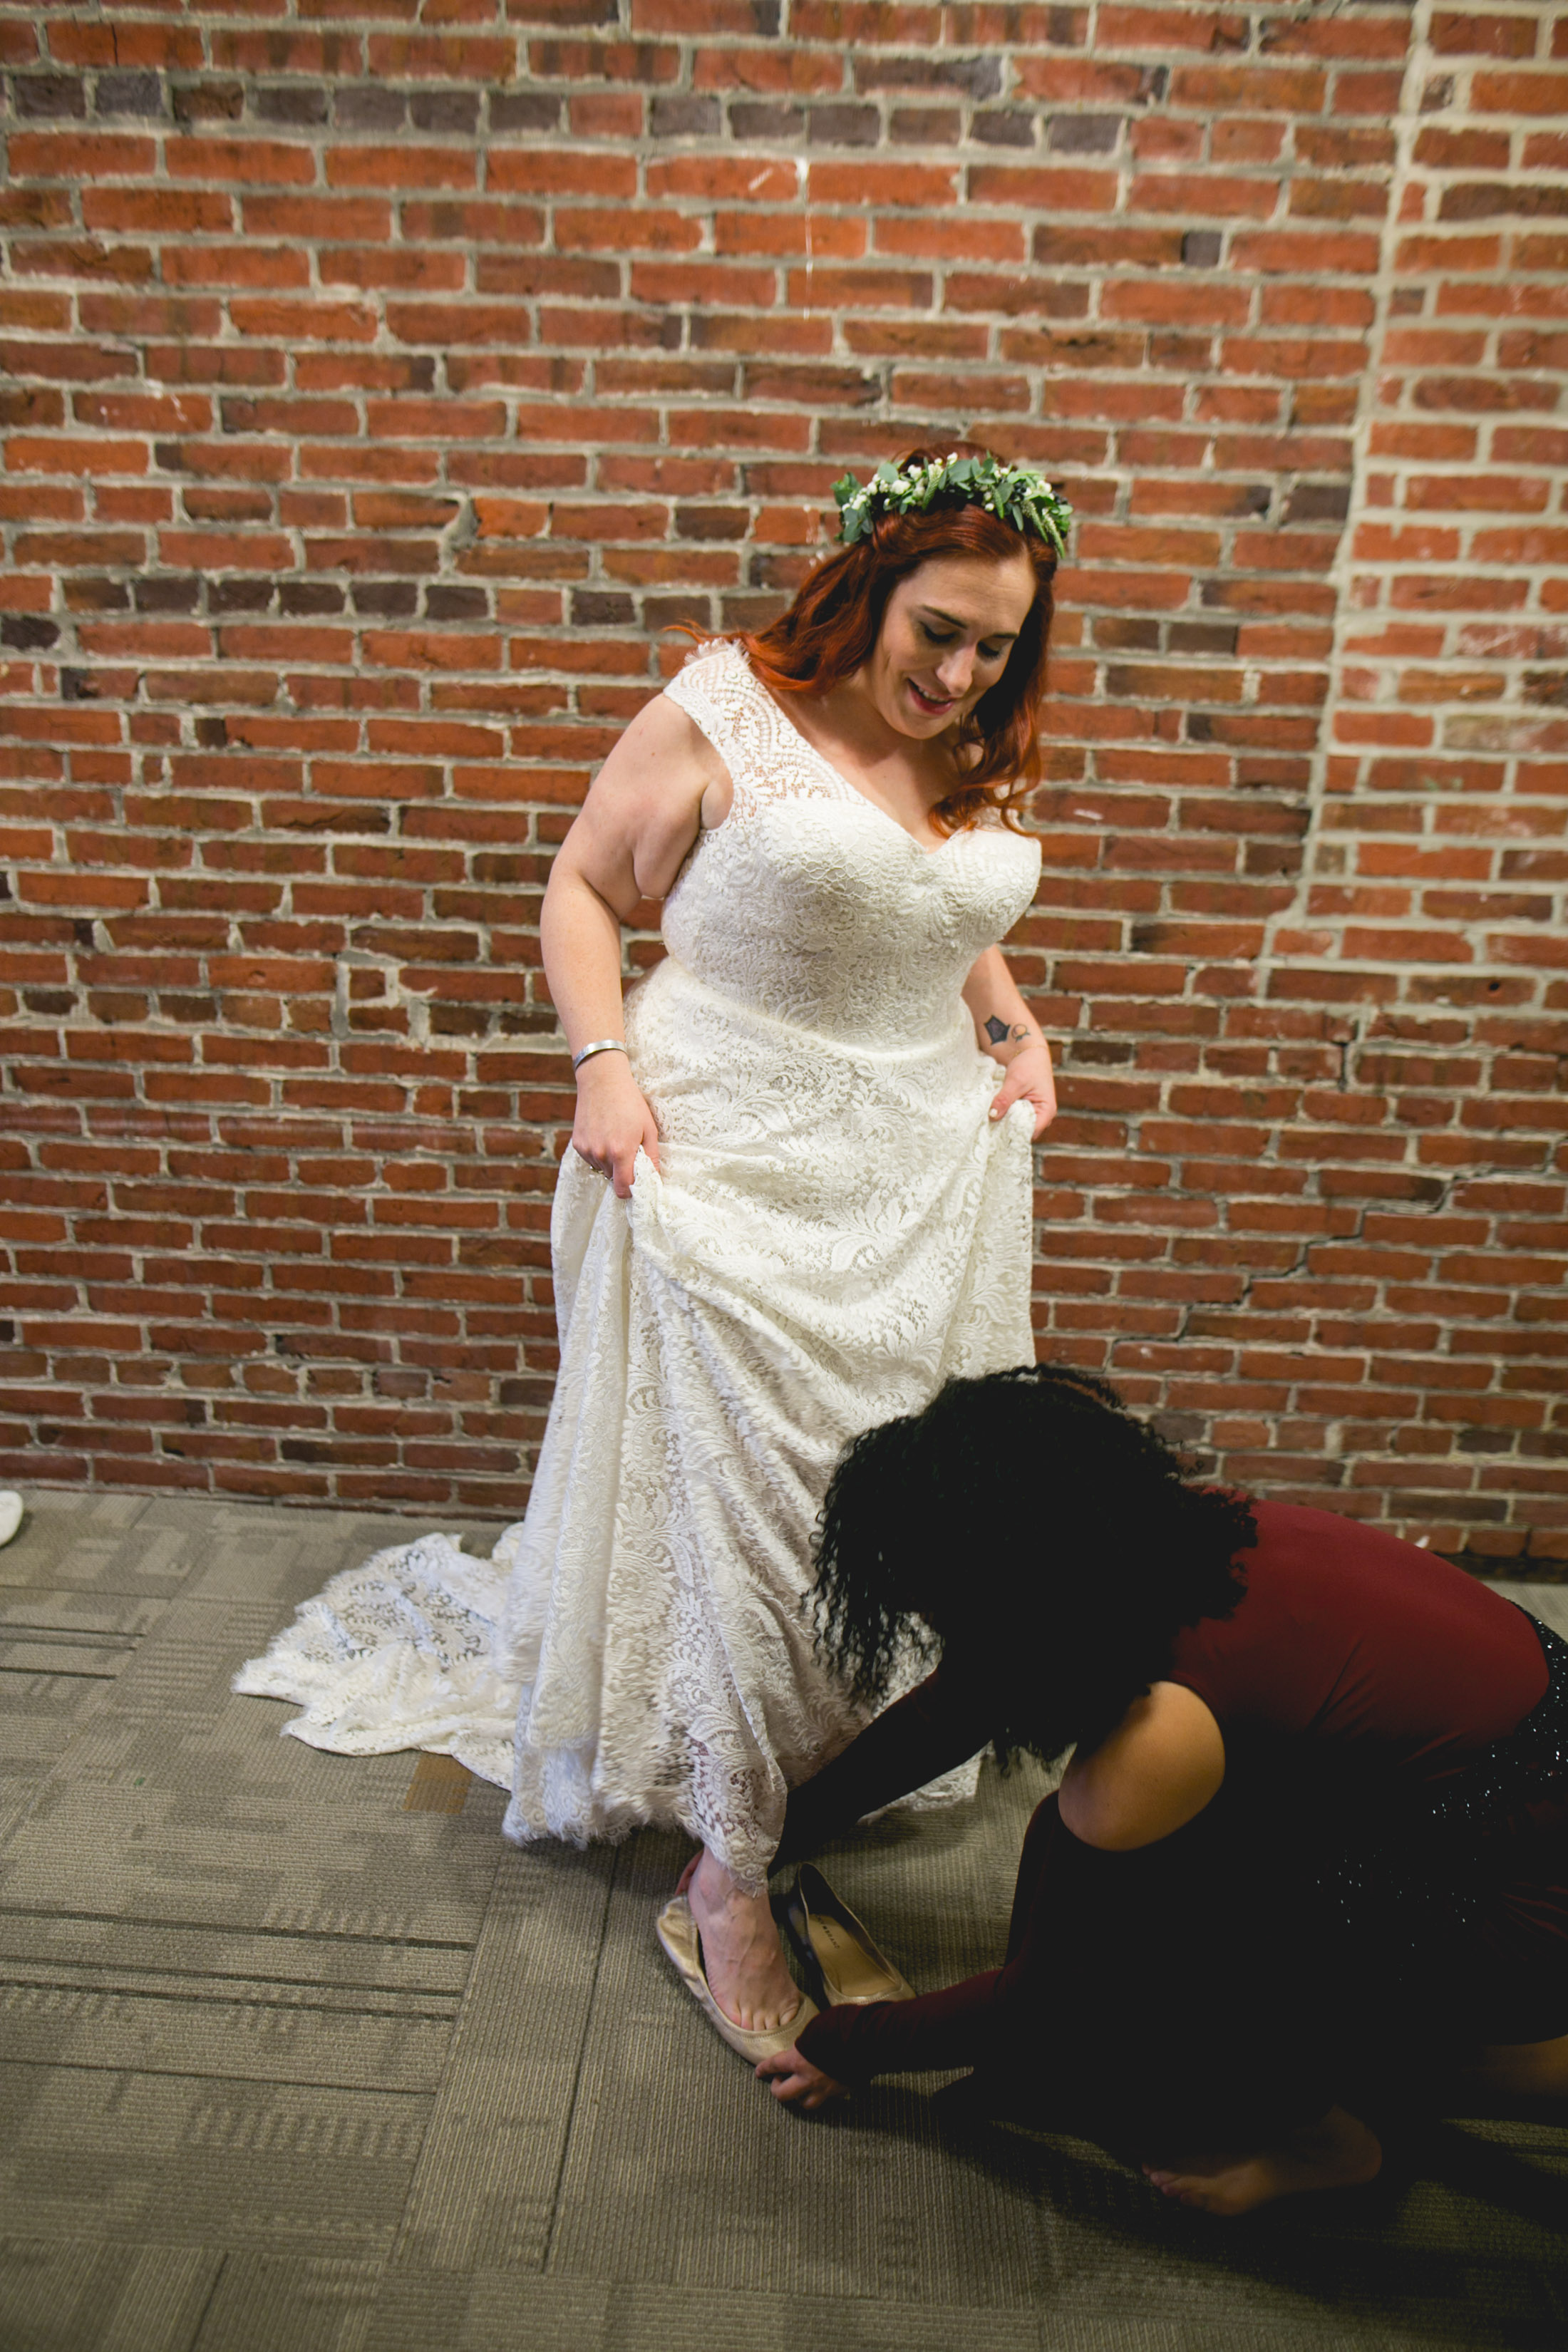 LGBTQ Philadelphia Wedding by Swiger Photography the Lesbian photographer 11